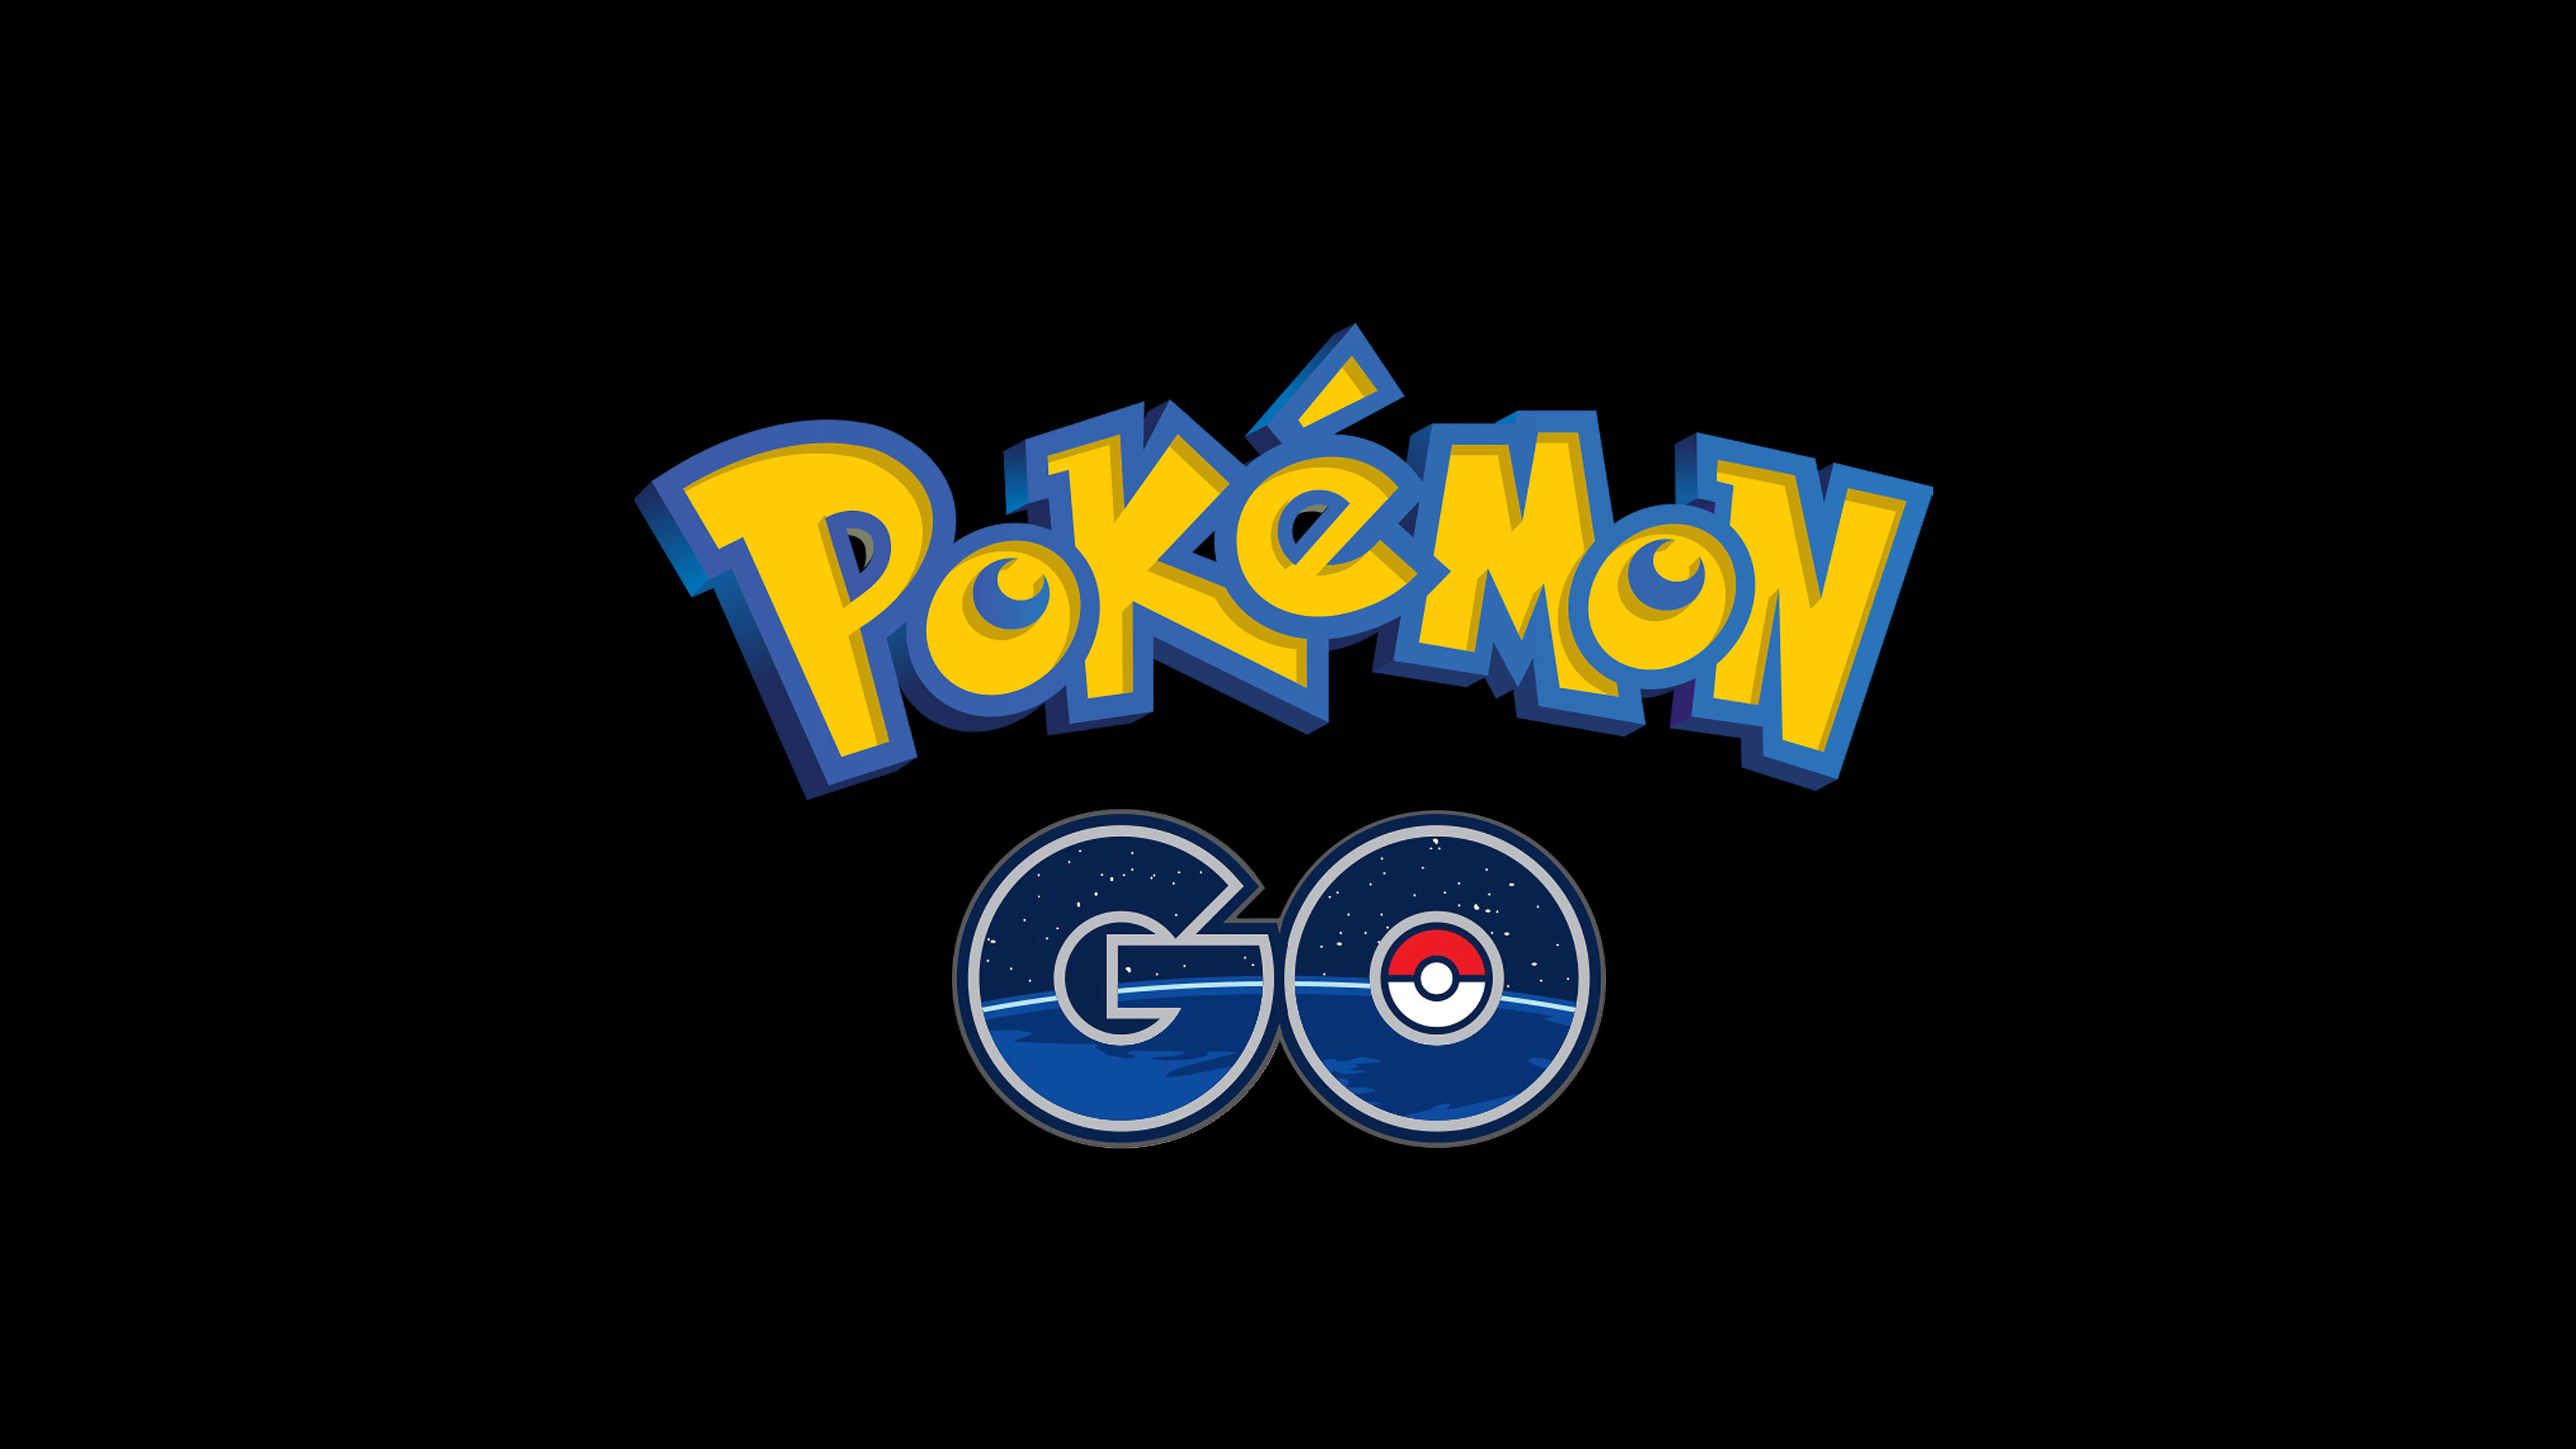 Pokémon Go 4K Logo wallpaper